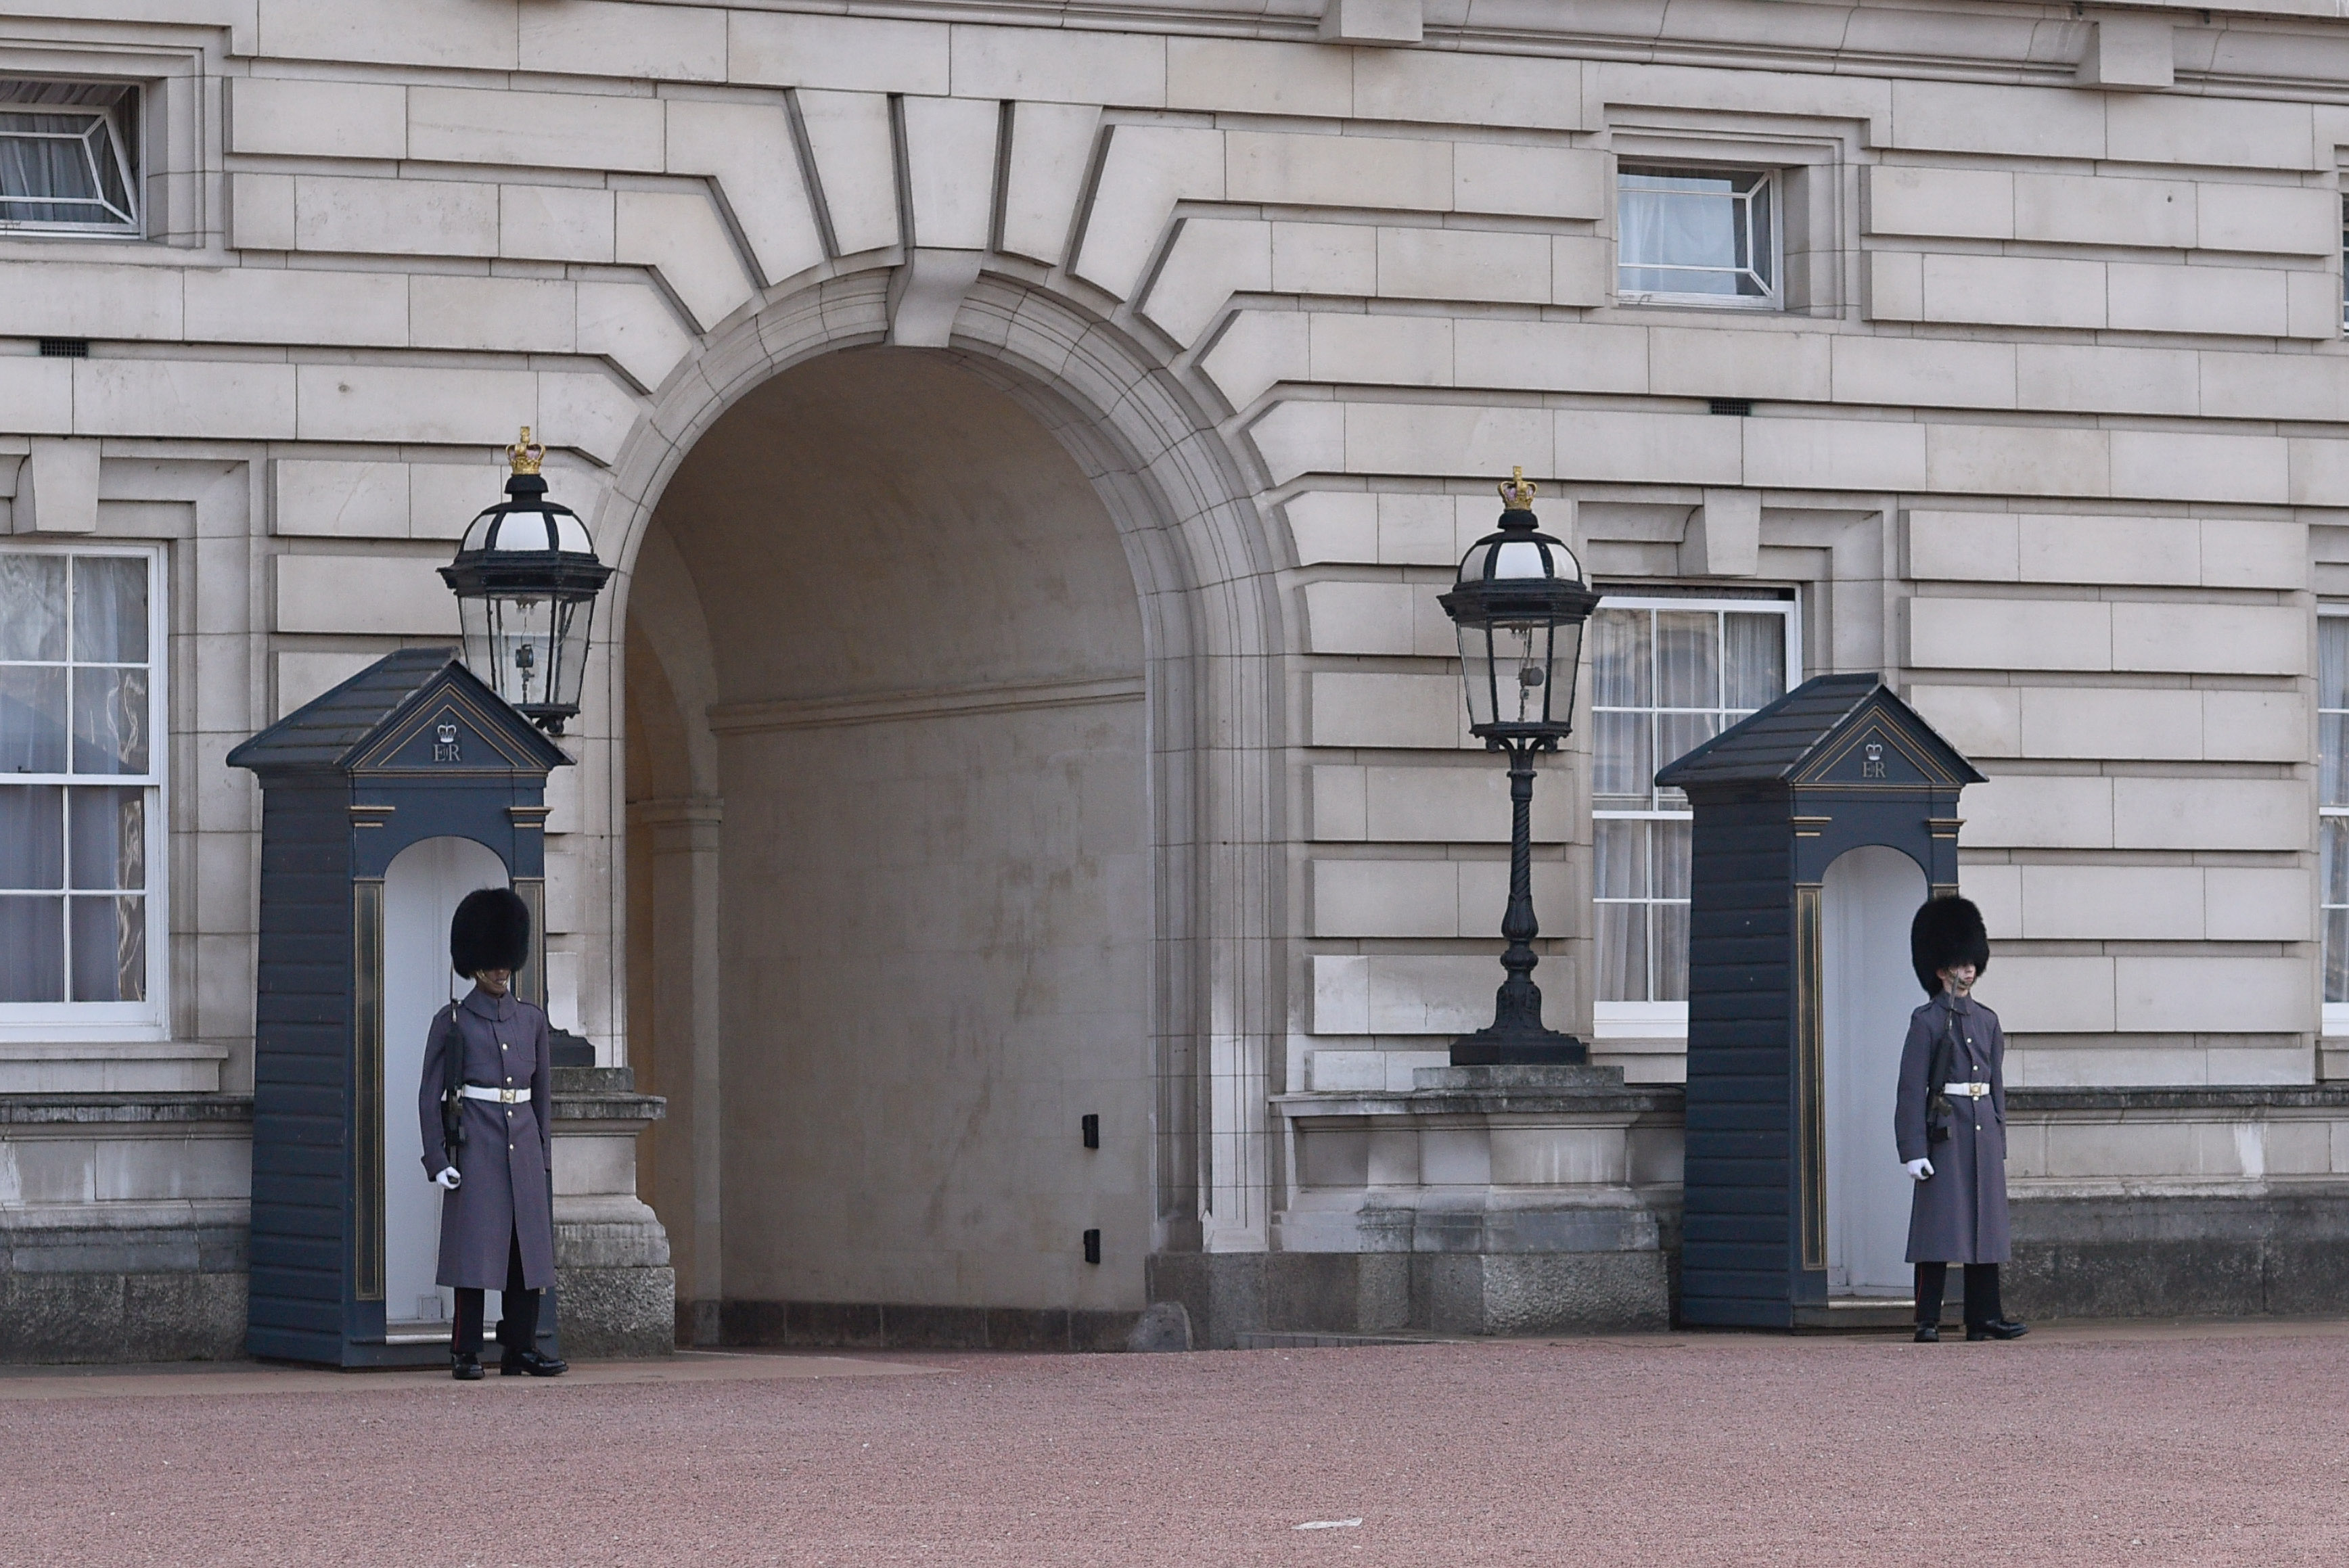 BuckinghamPalace1